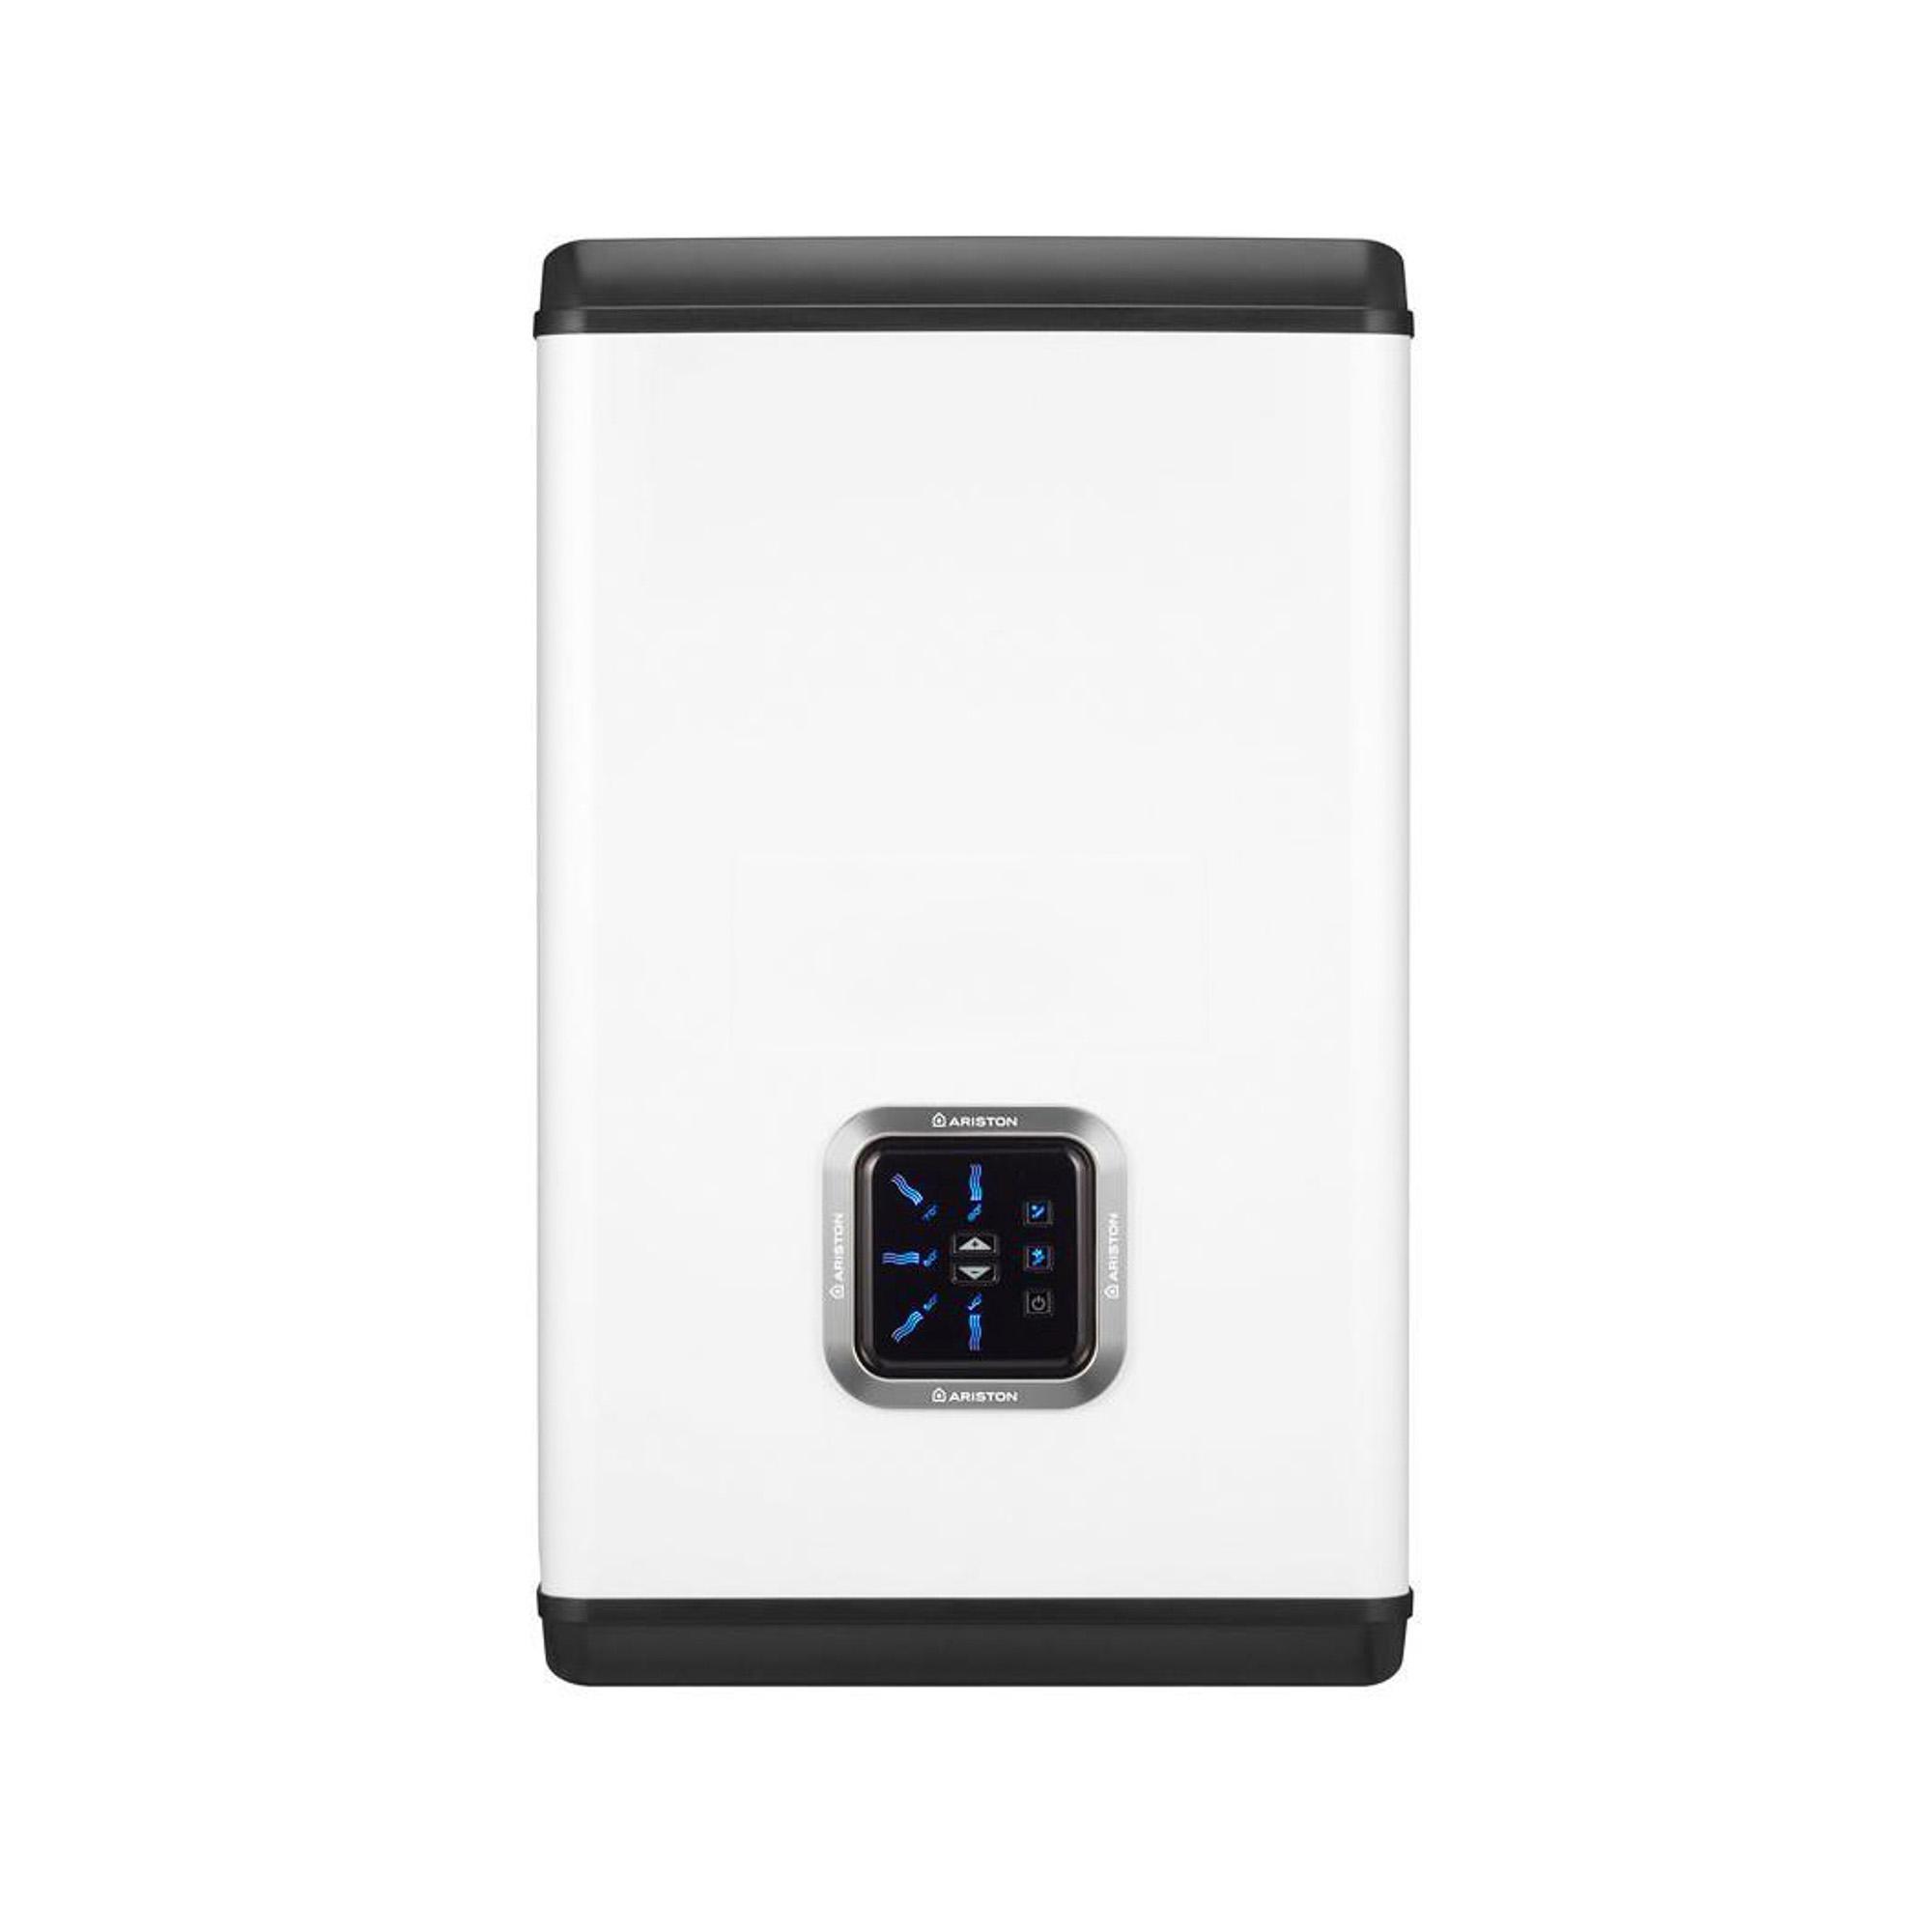 Водонагреватель Hotpoint-Ariston ABS VLS INOX PW 30 White (3605496)